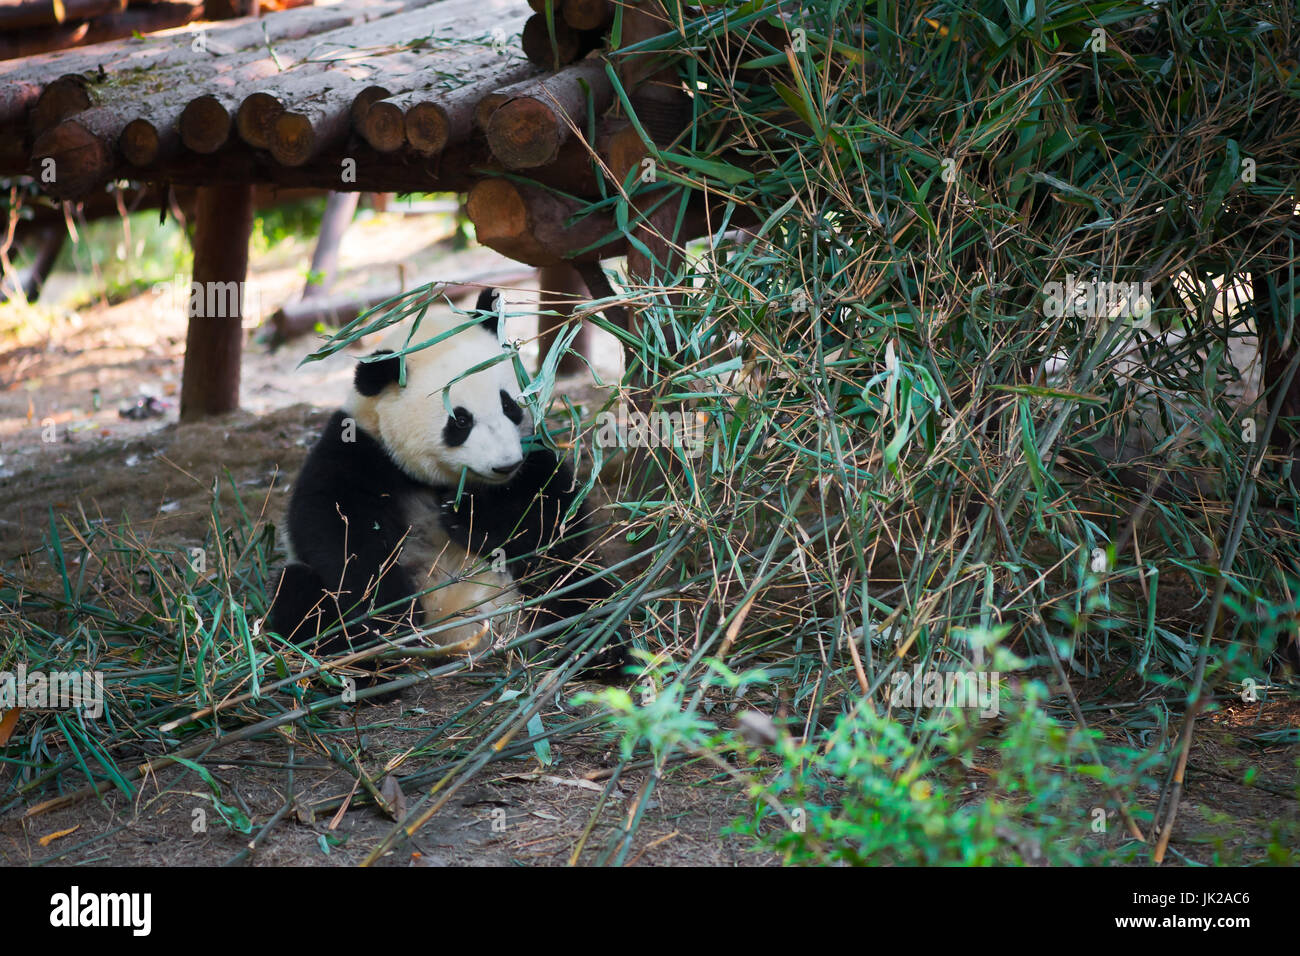 Panda Cub Sitzen Und Essen Bambus Chengdu Provinz Sichuan China